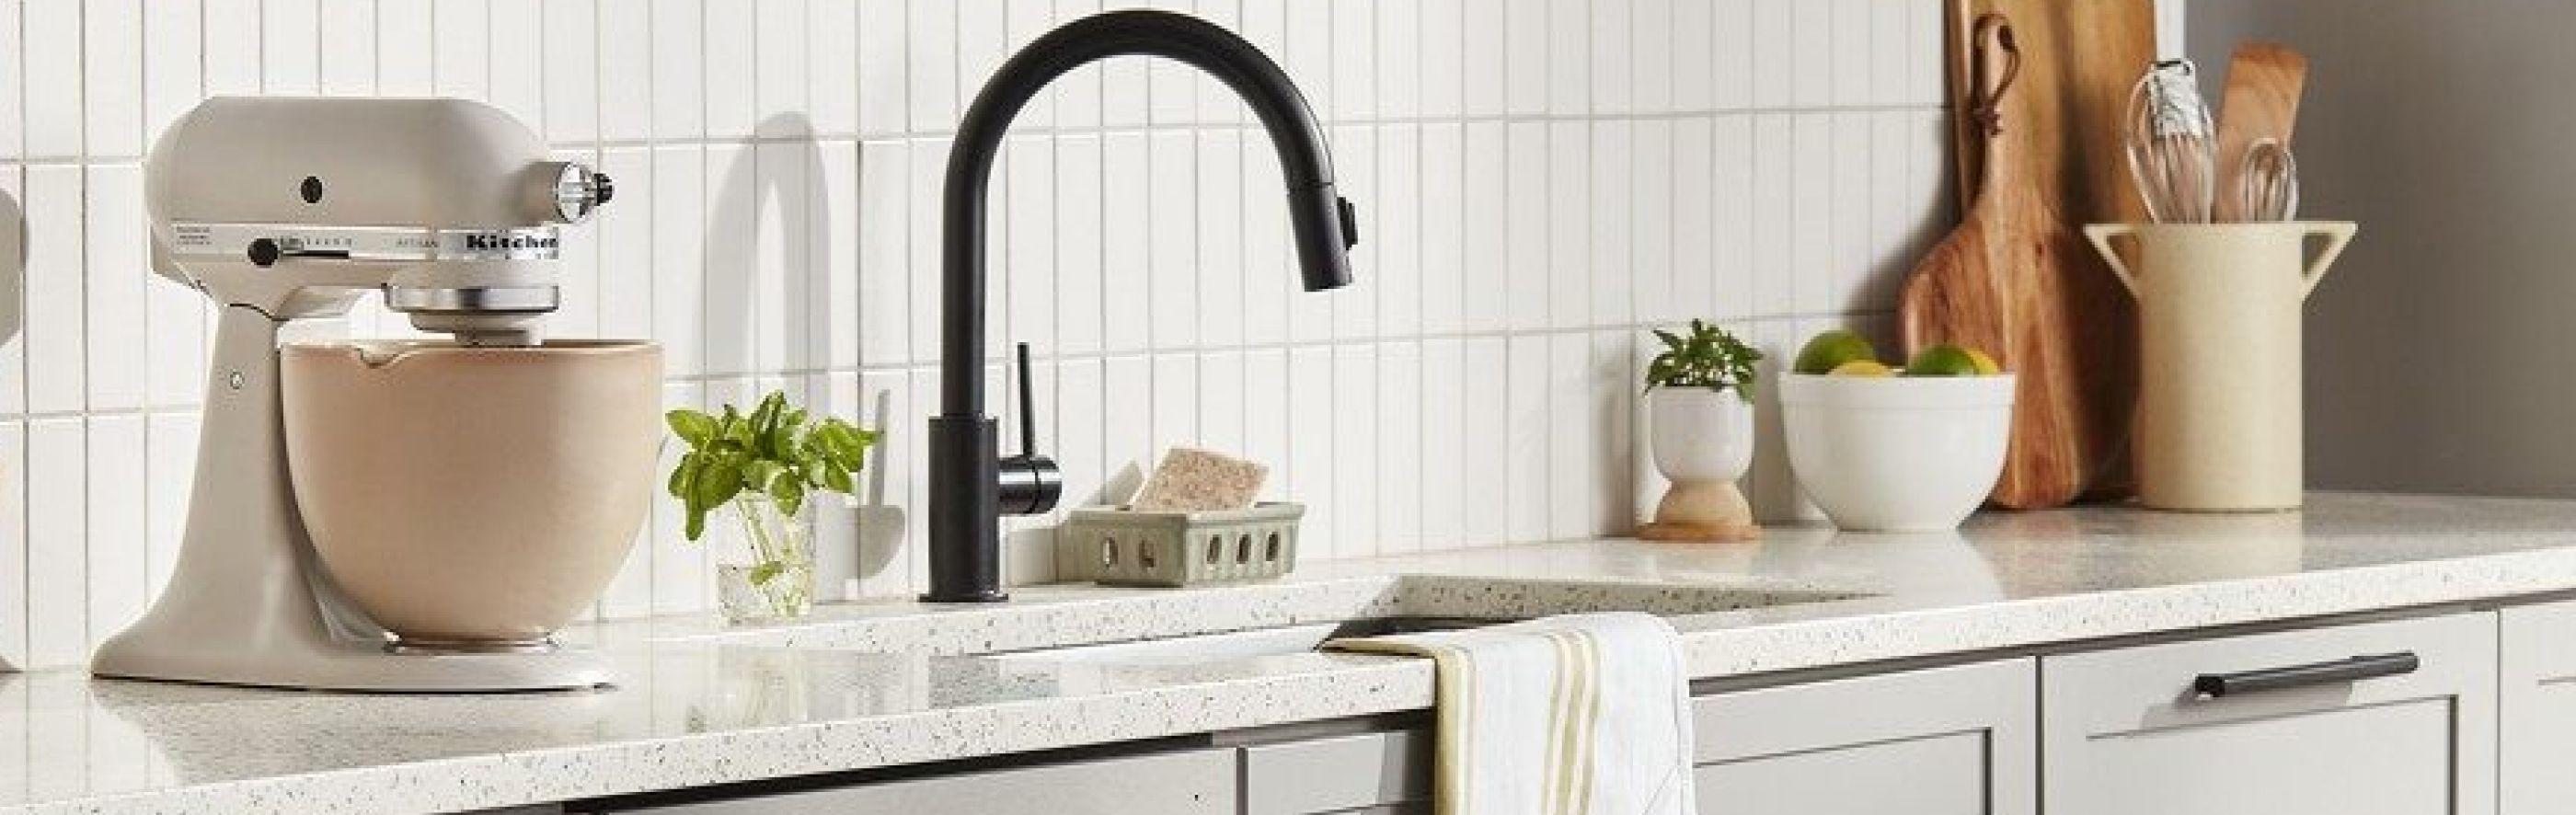 KitchenAid® stand mixer on a countertop next to a kitchen sink